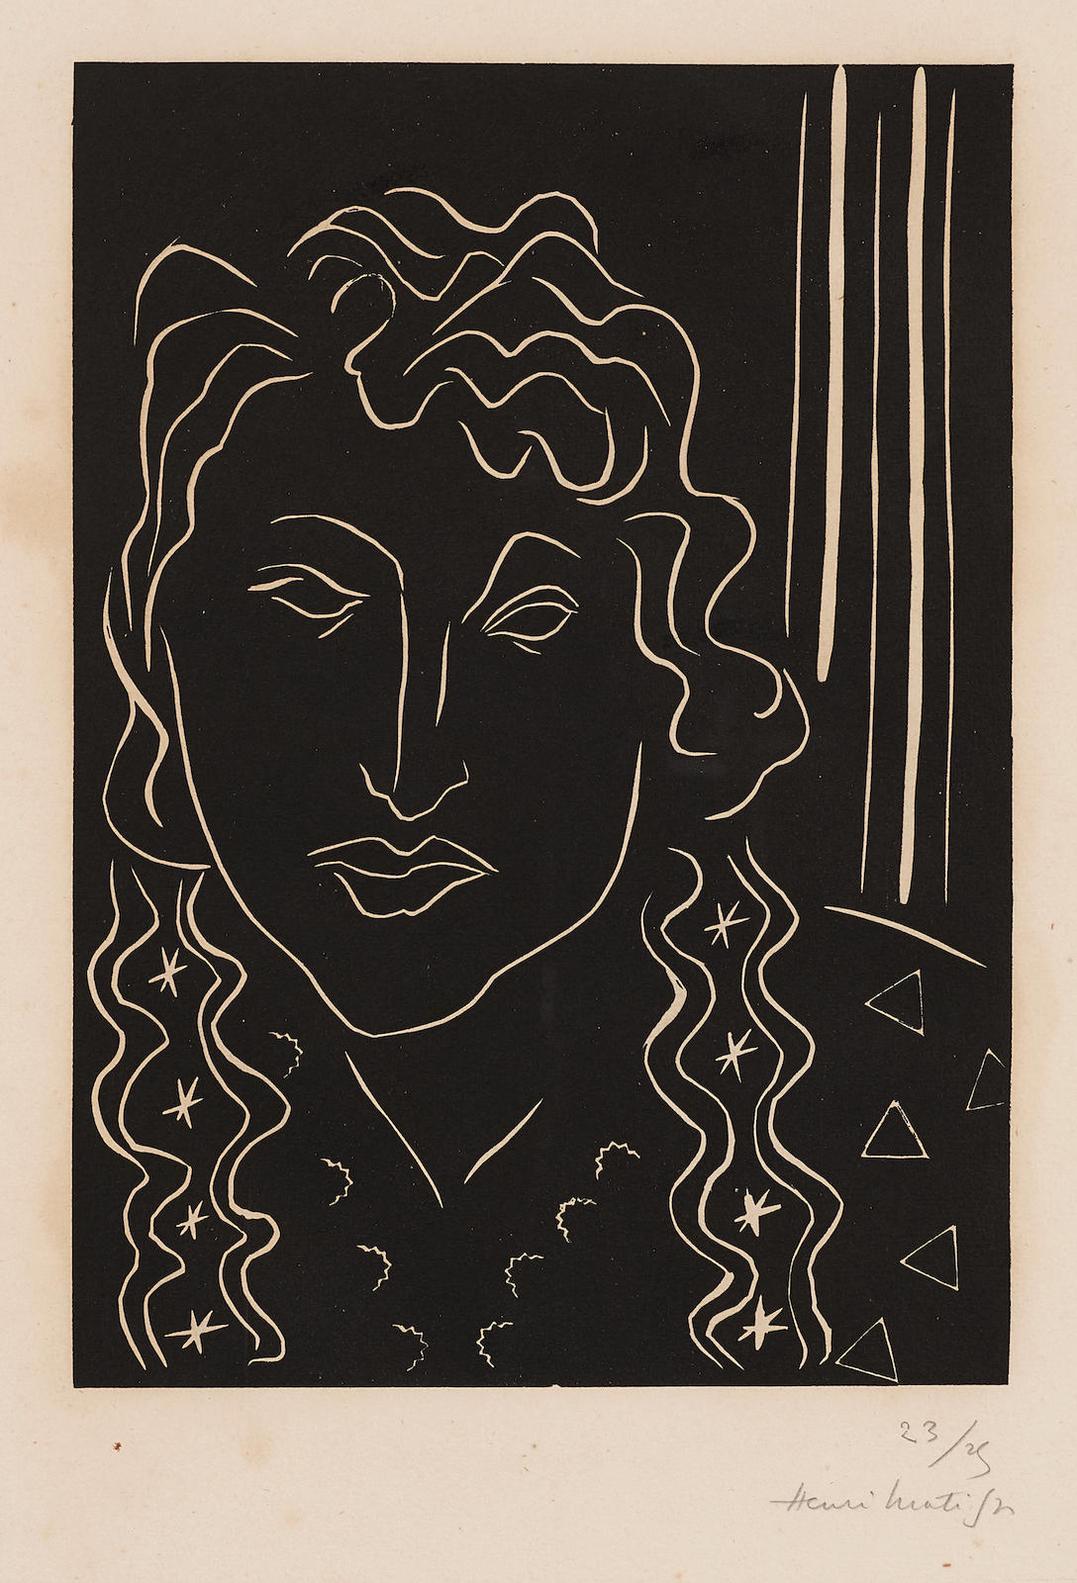 Henri Matisse-La Belle Tahitienne-1938